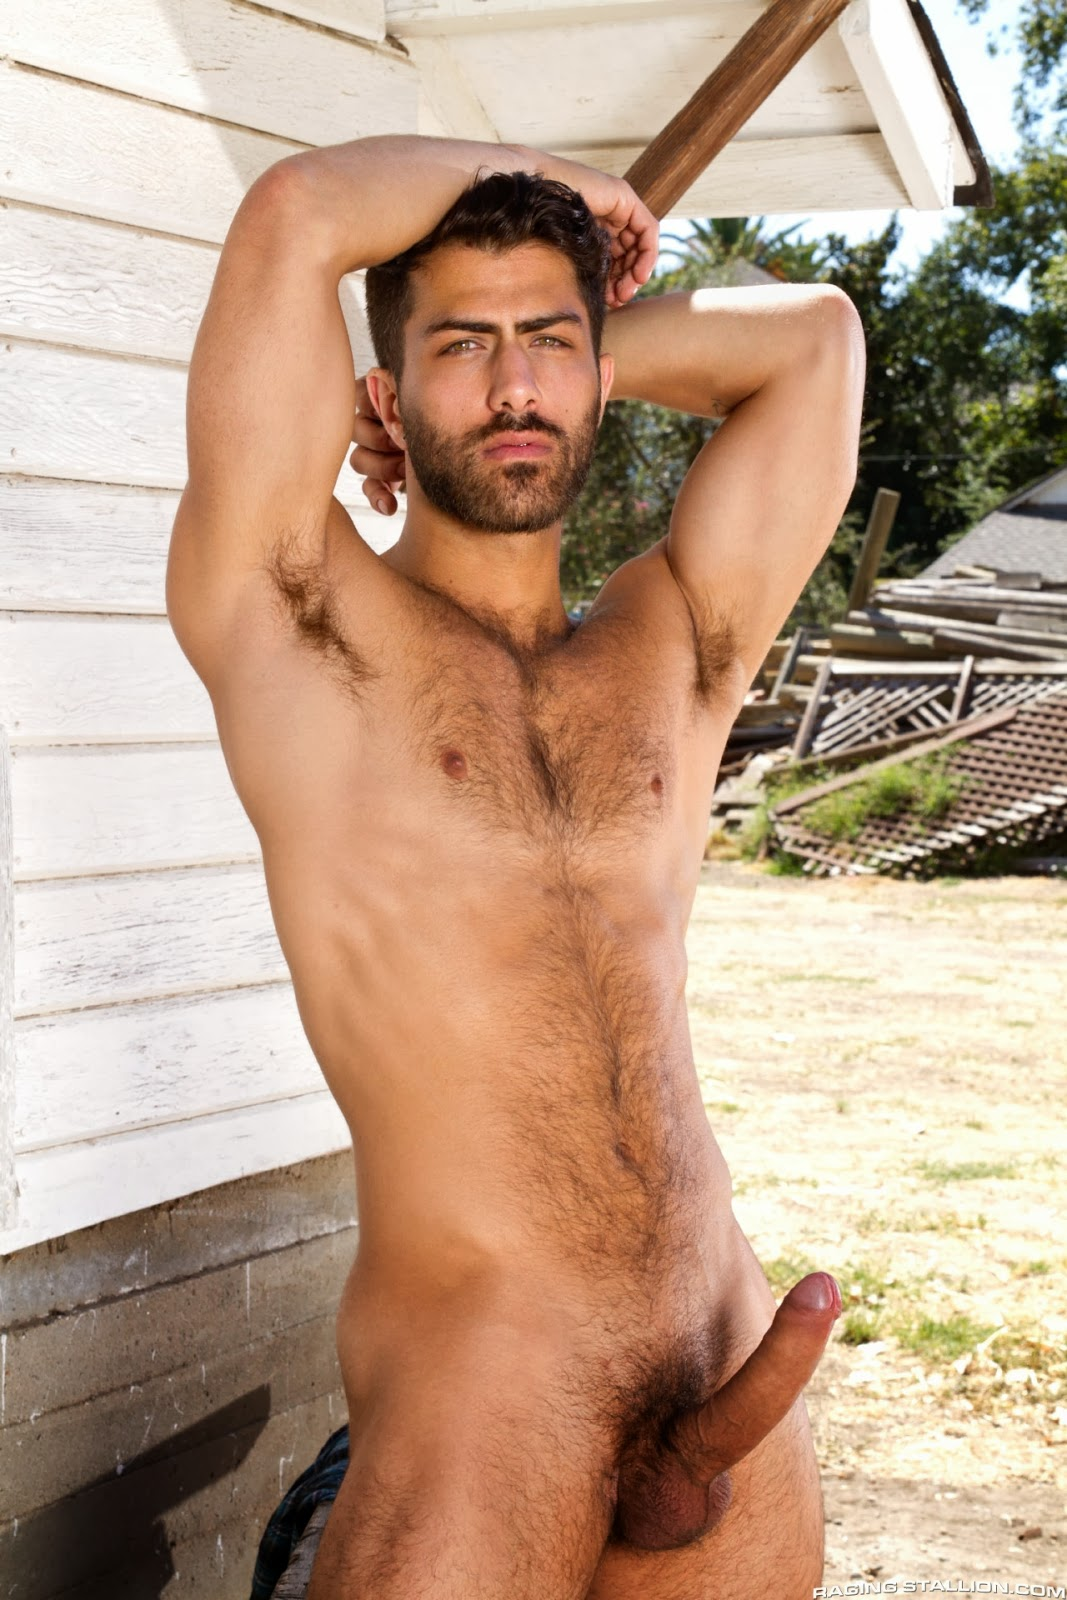 gay nude beach italy